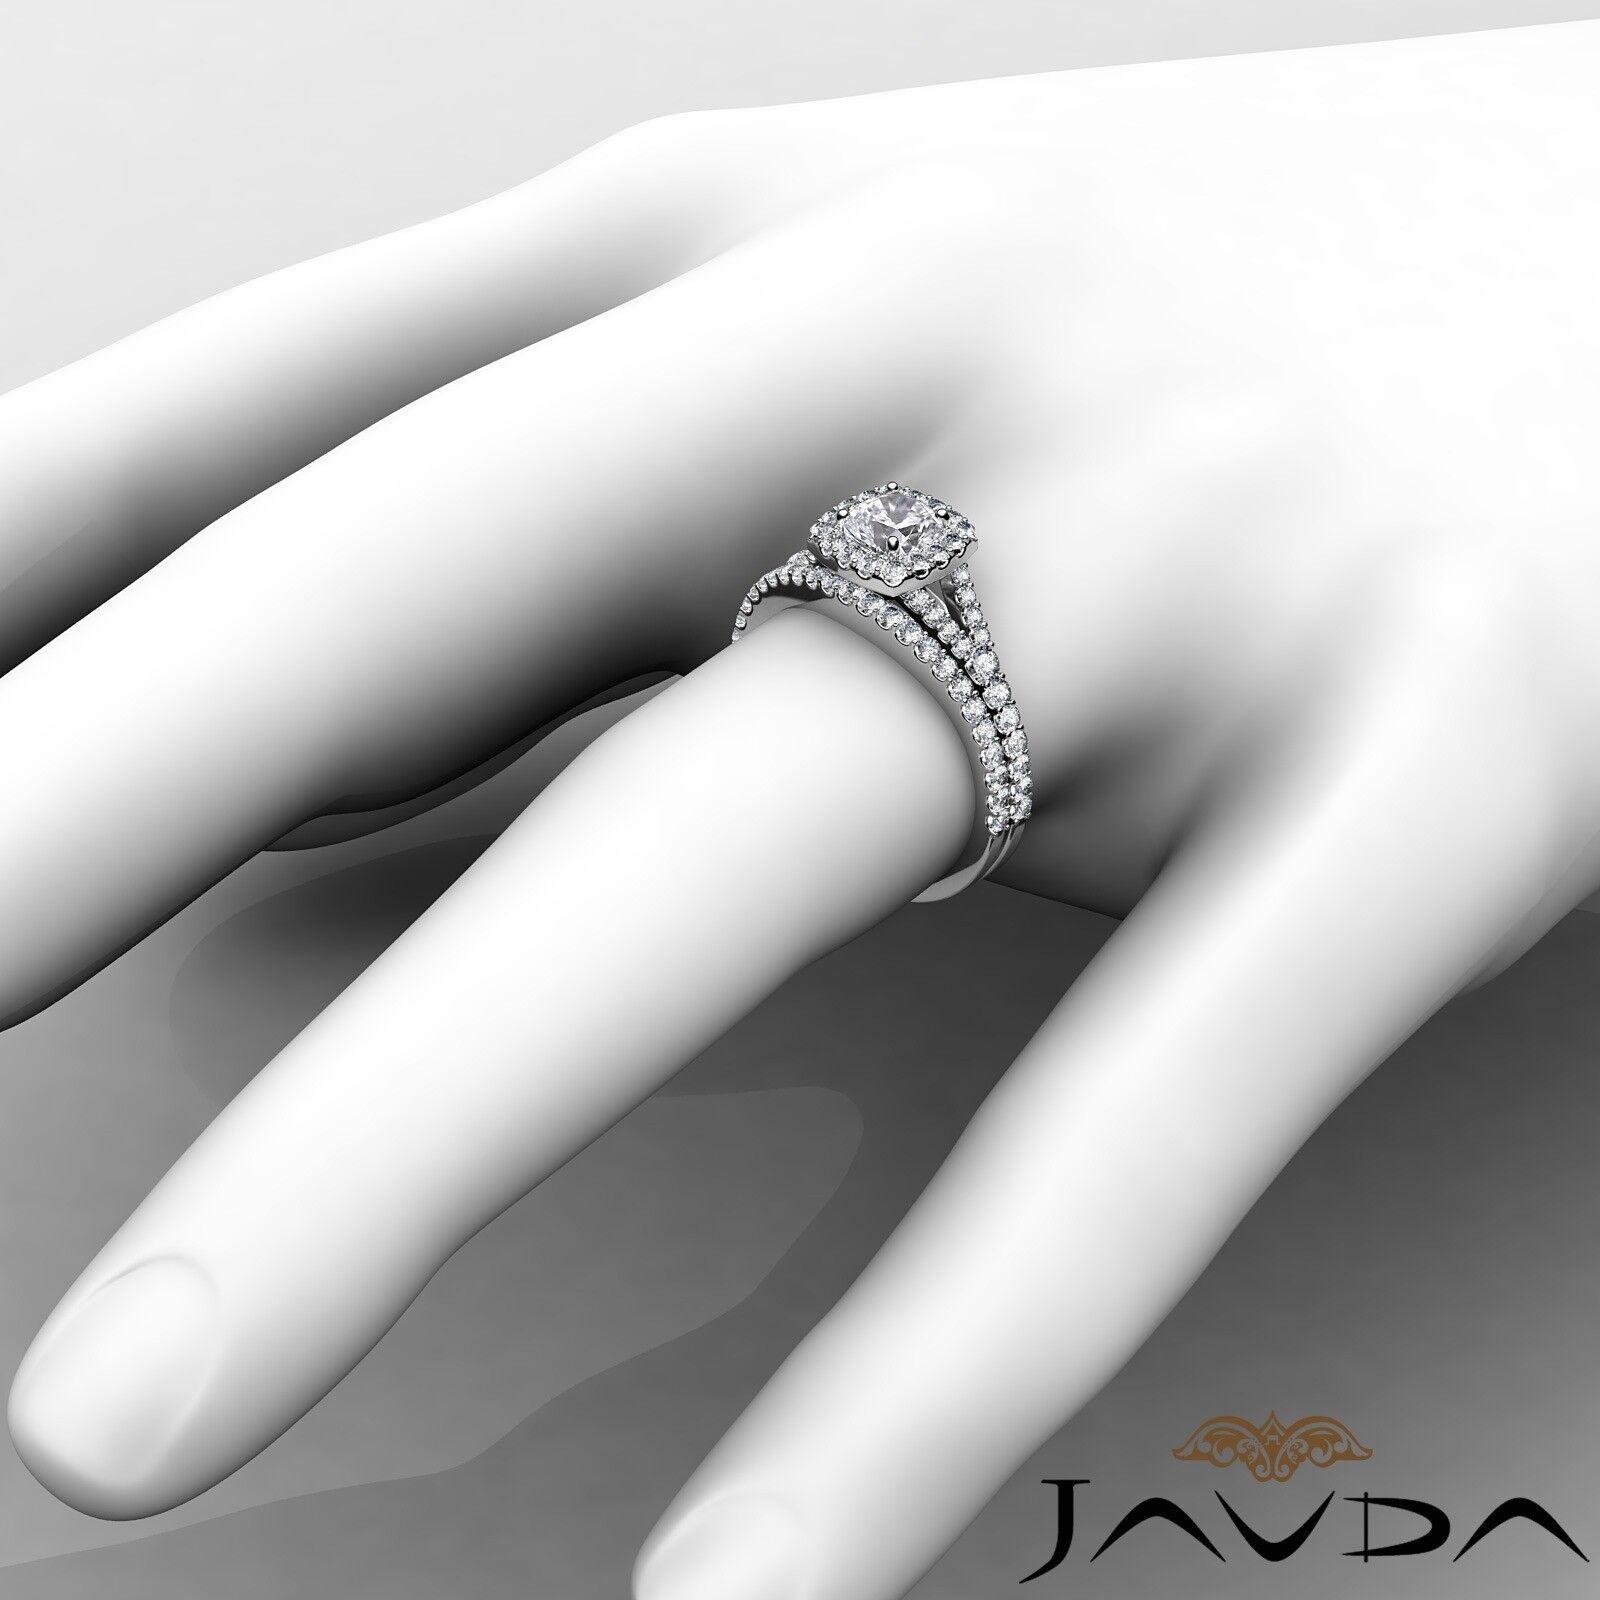 1.55ctw U Cut Pave Halo Bridal Cushion Diamond Engagement Ring GIA F-VVS2 W Gold 4